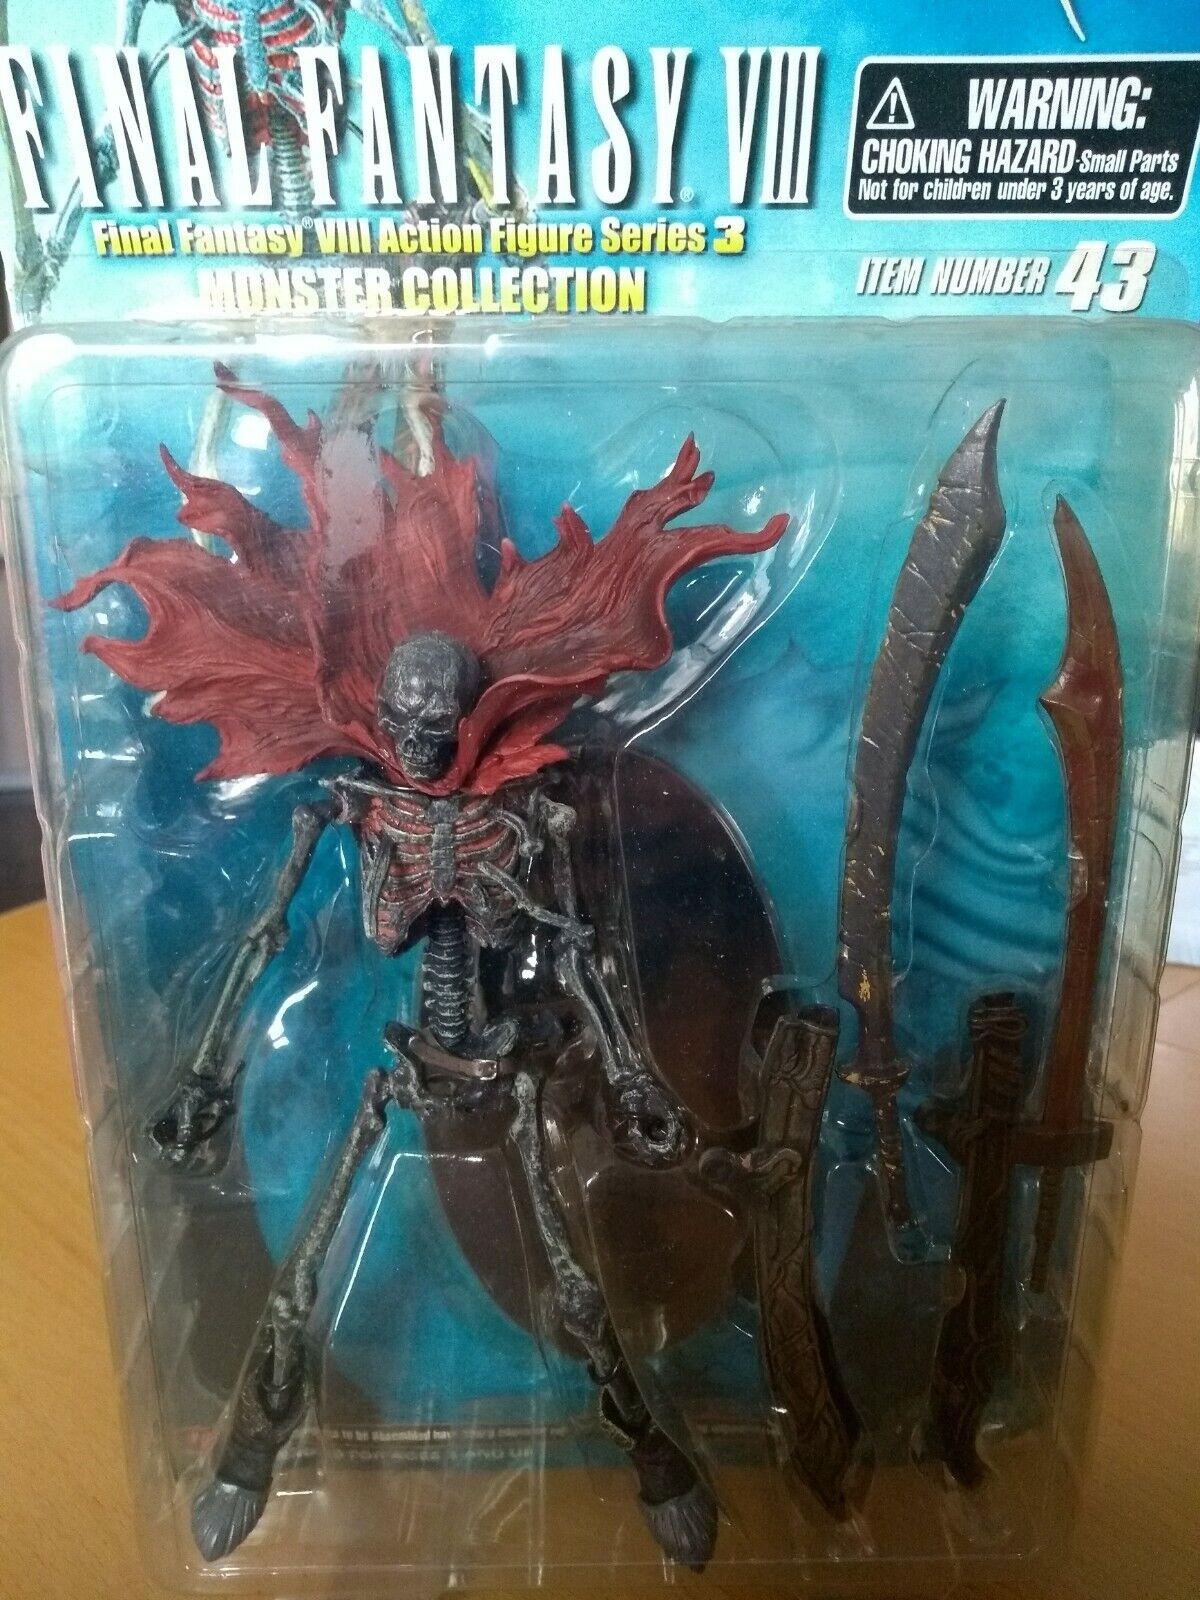 Kotobukiya Final Fantasy VIII monstruo Collection skeleton Action Figure